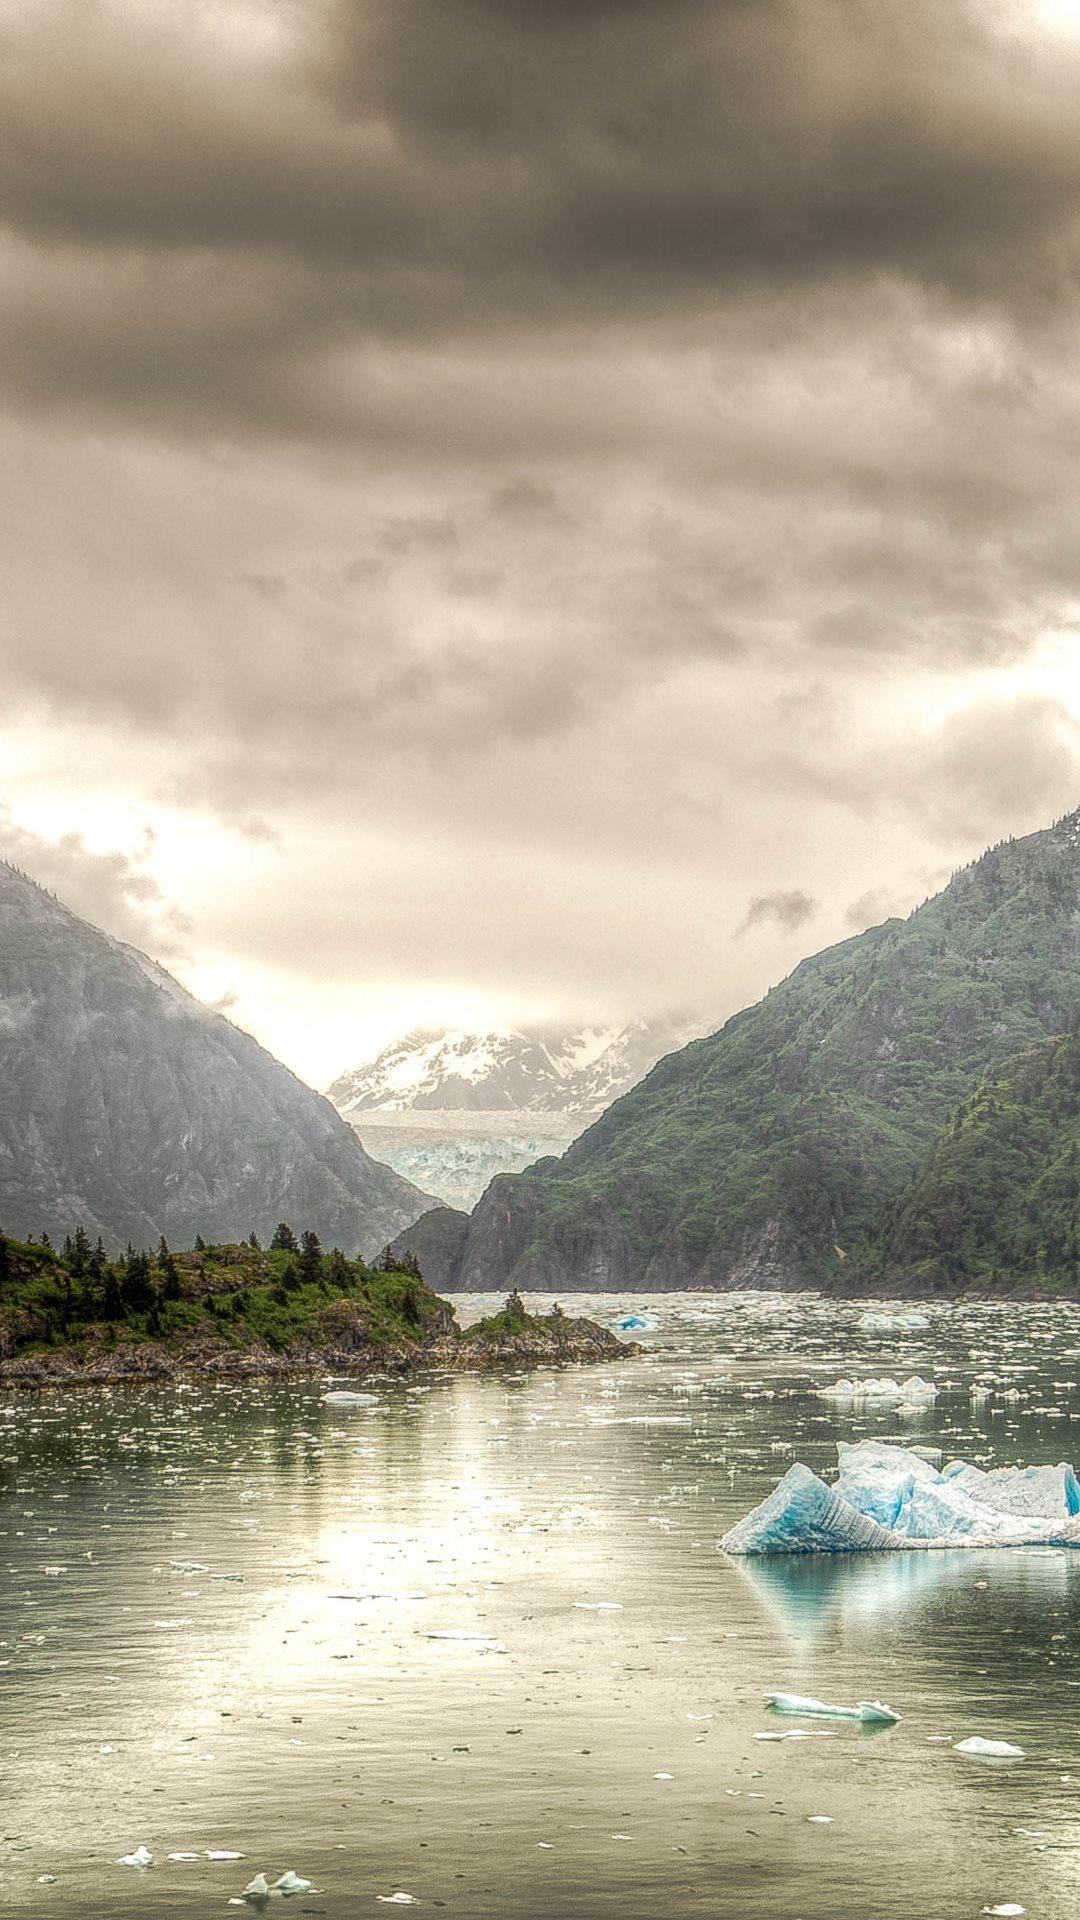 4k alaska wallpapers high quality download free - 4k wallpaper download ...